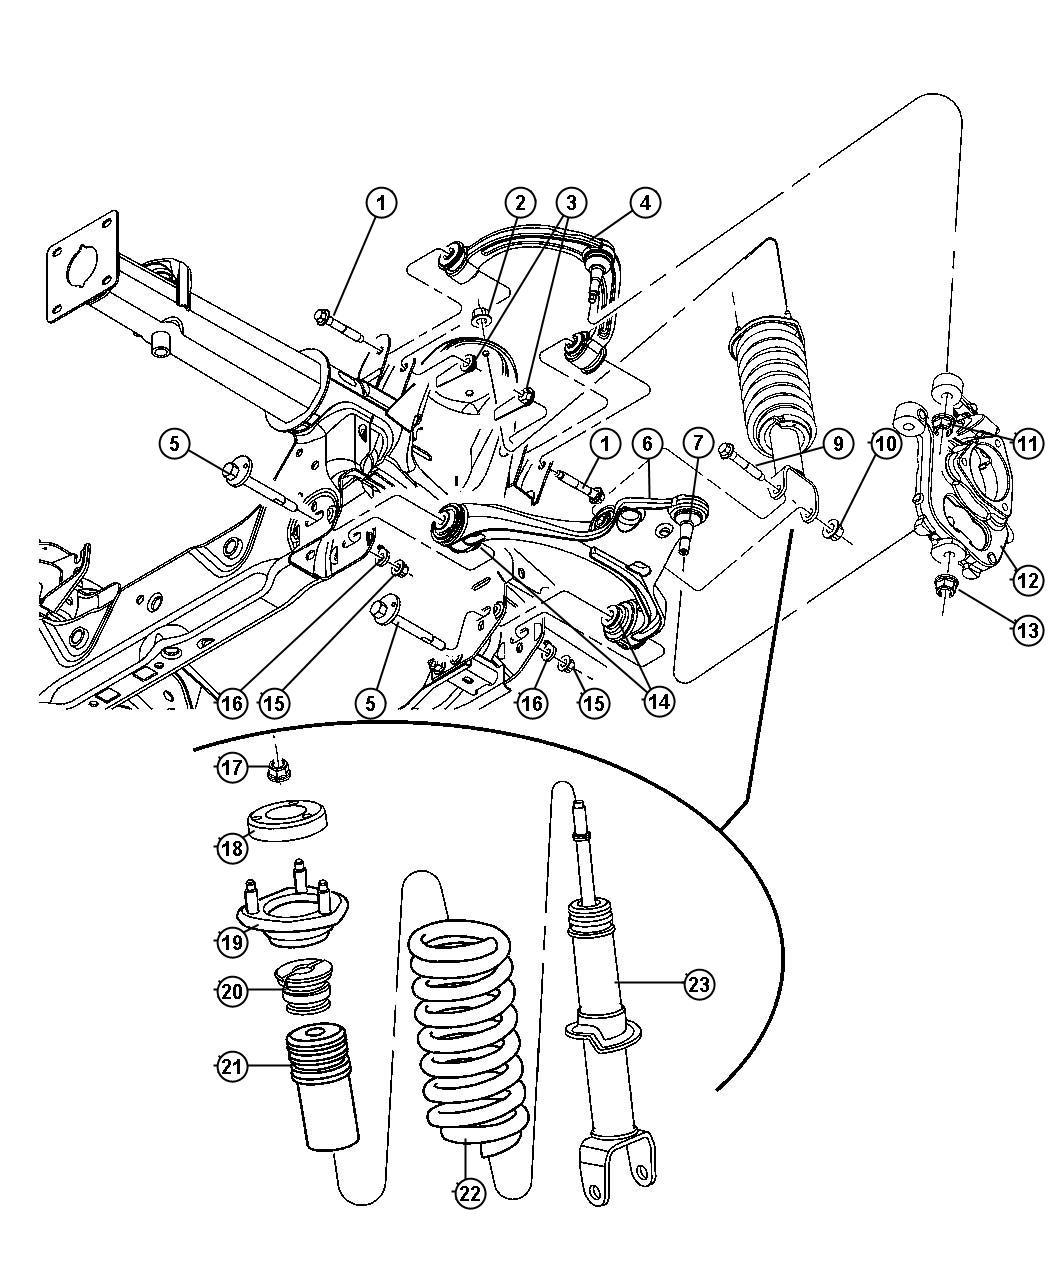 dodge dakota suspension parts diagram 2003 yzf r6 wiring ram 1500 upgrade imageresizertool com